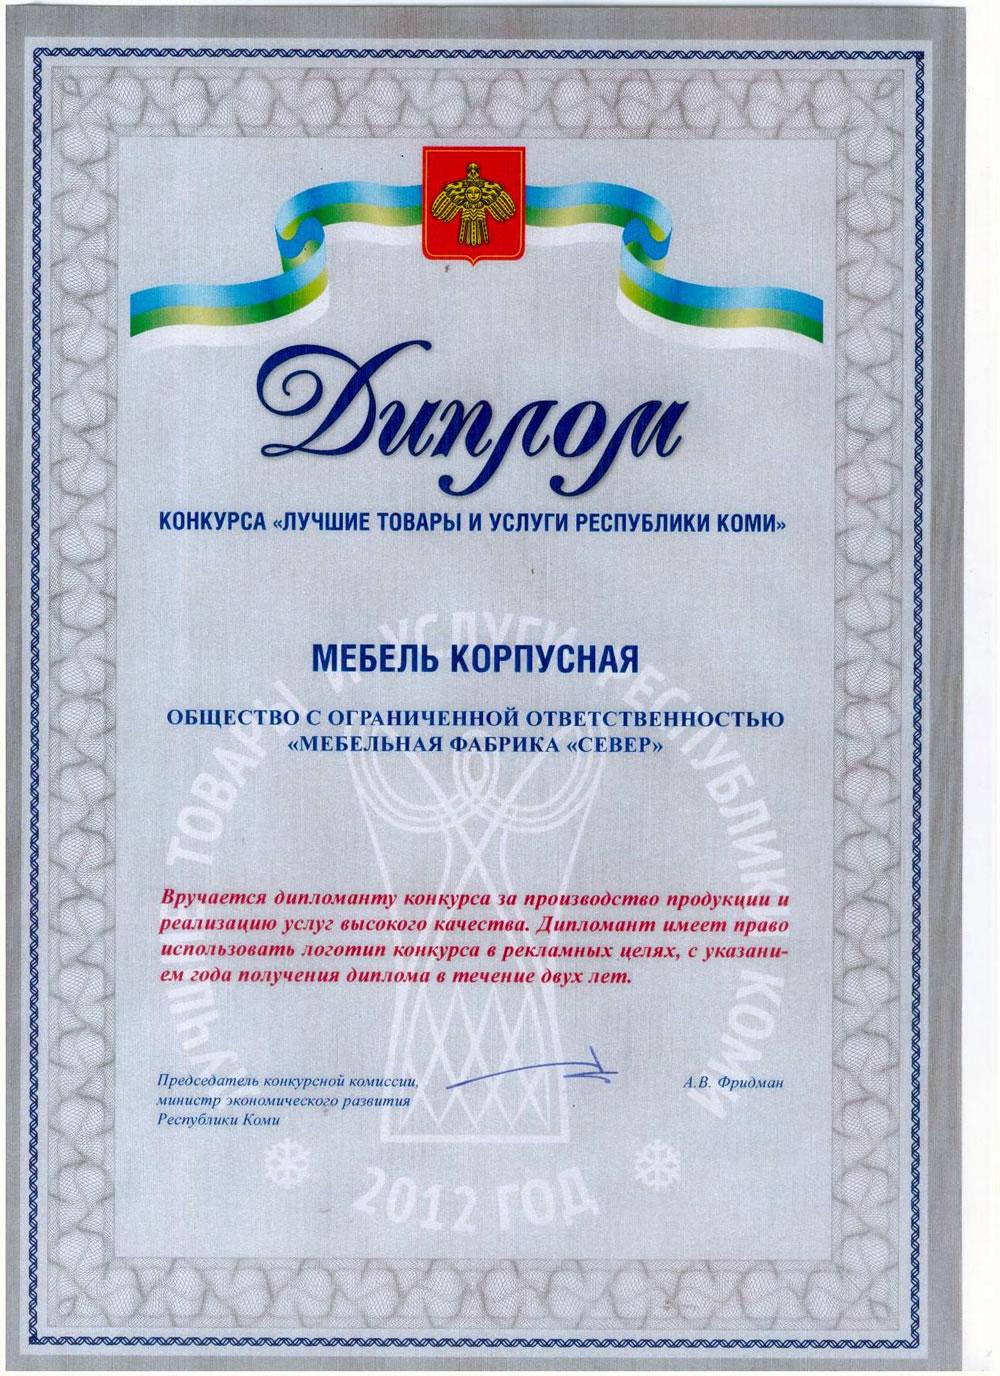 mebel_korpusnaya